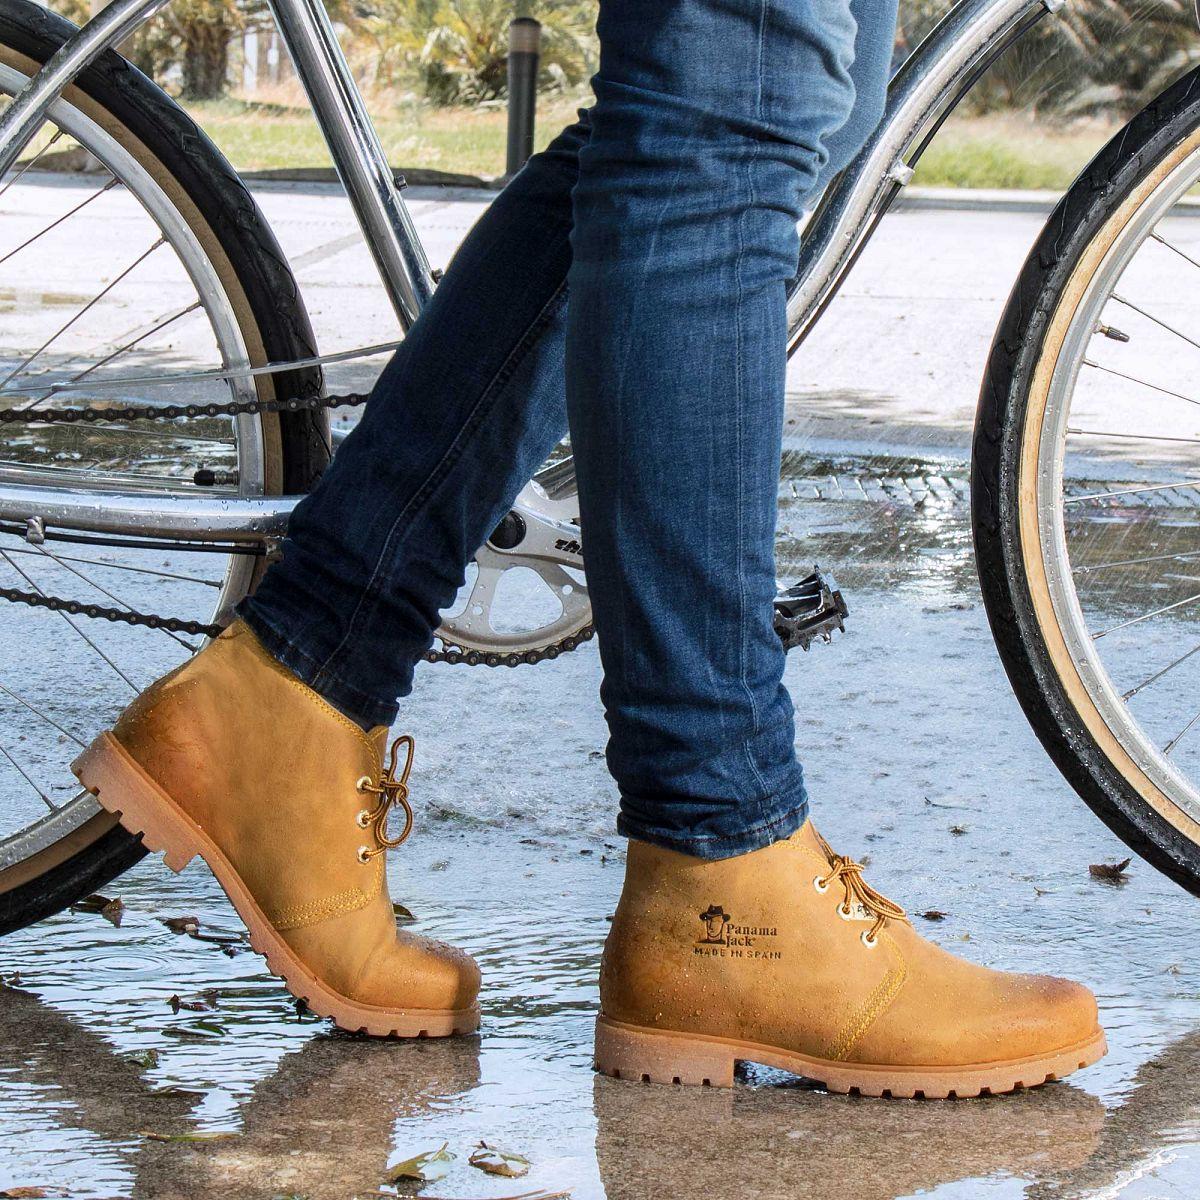 4e08229b Men's ankle boot BOTA PANAMA vintage | PANAMA JACK® Official